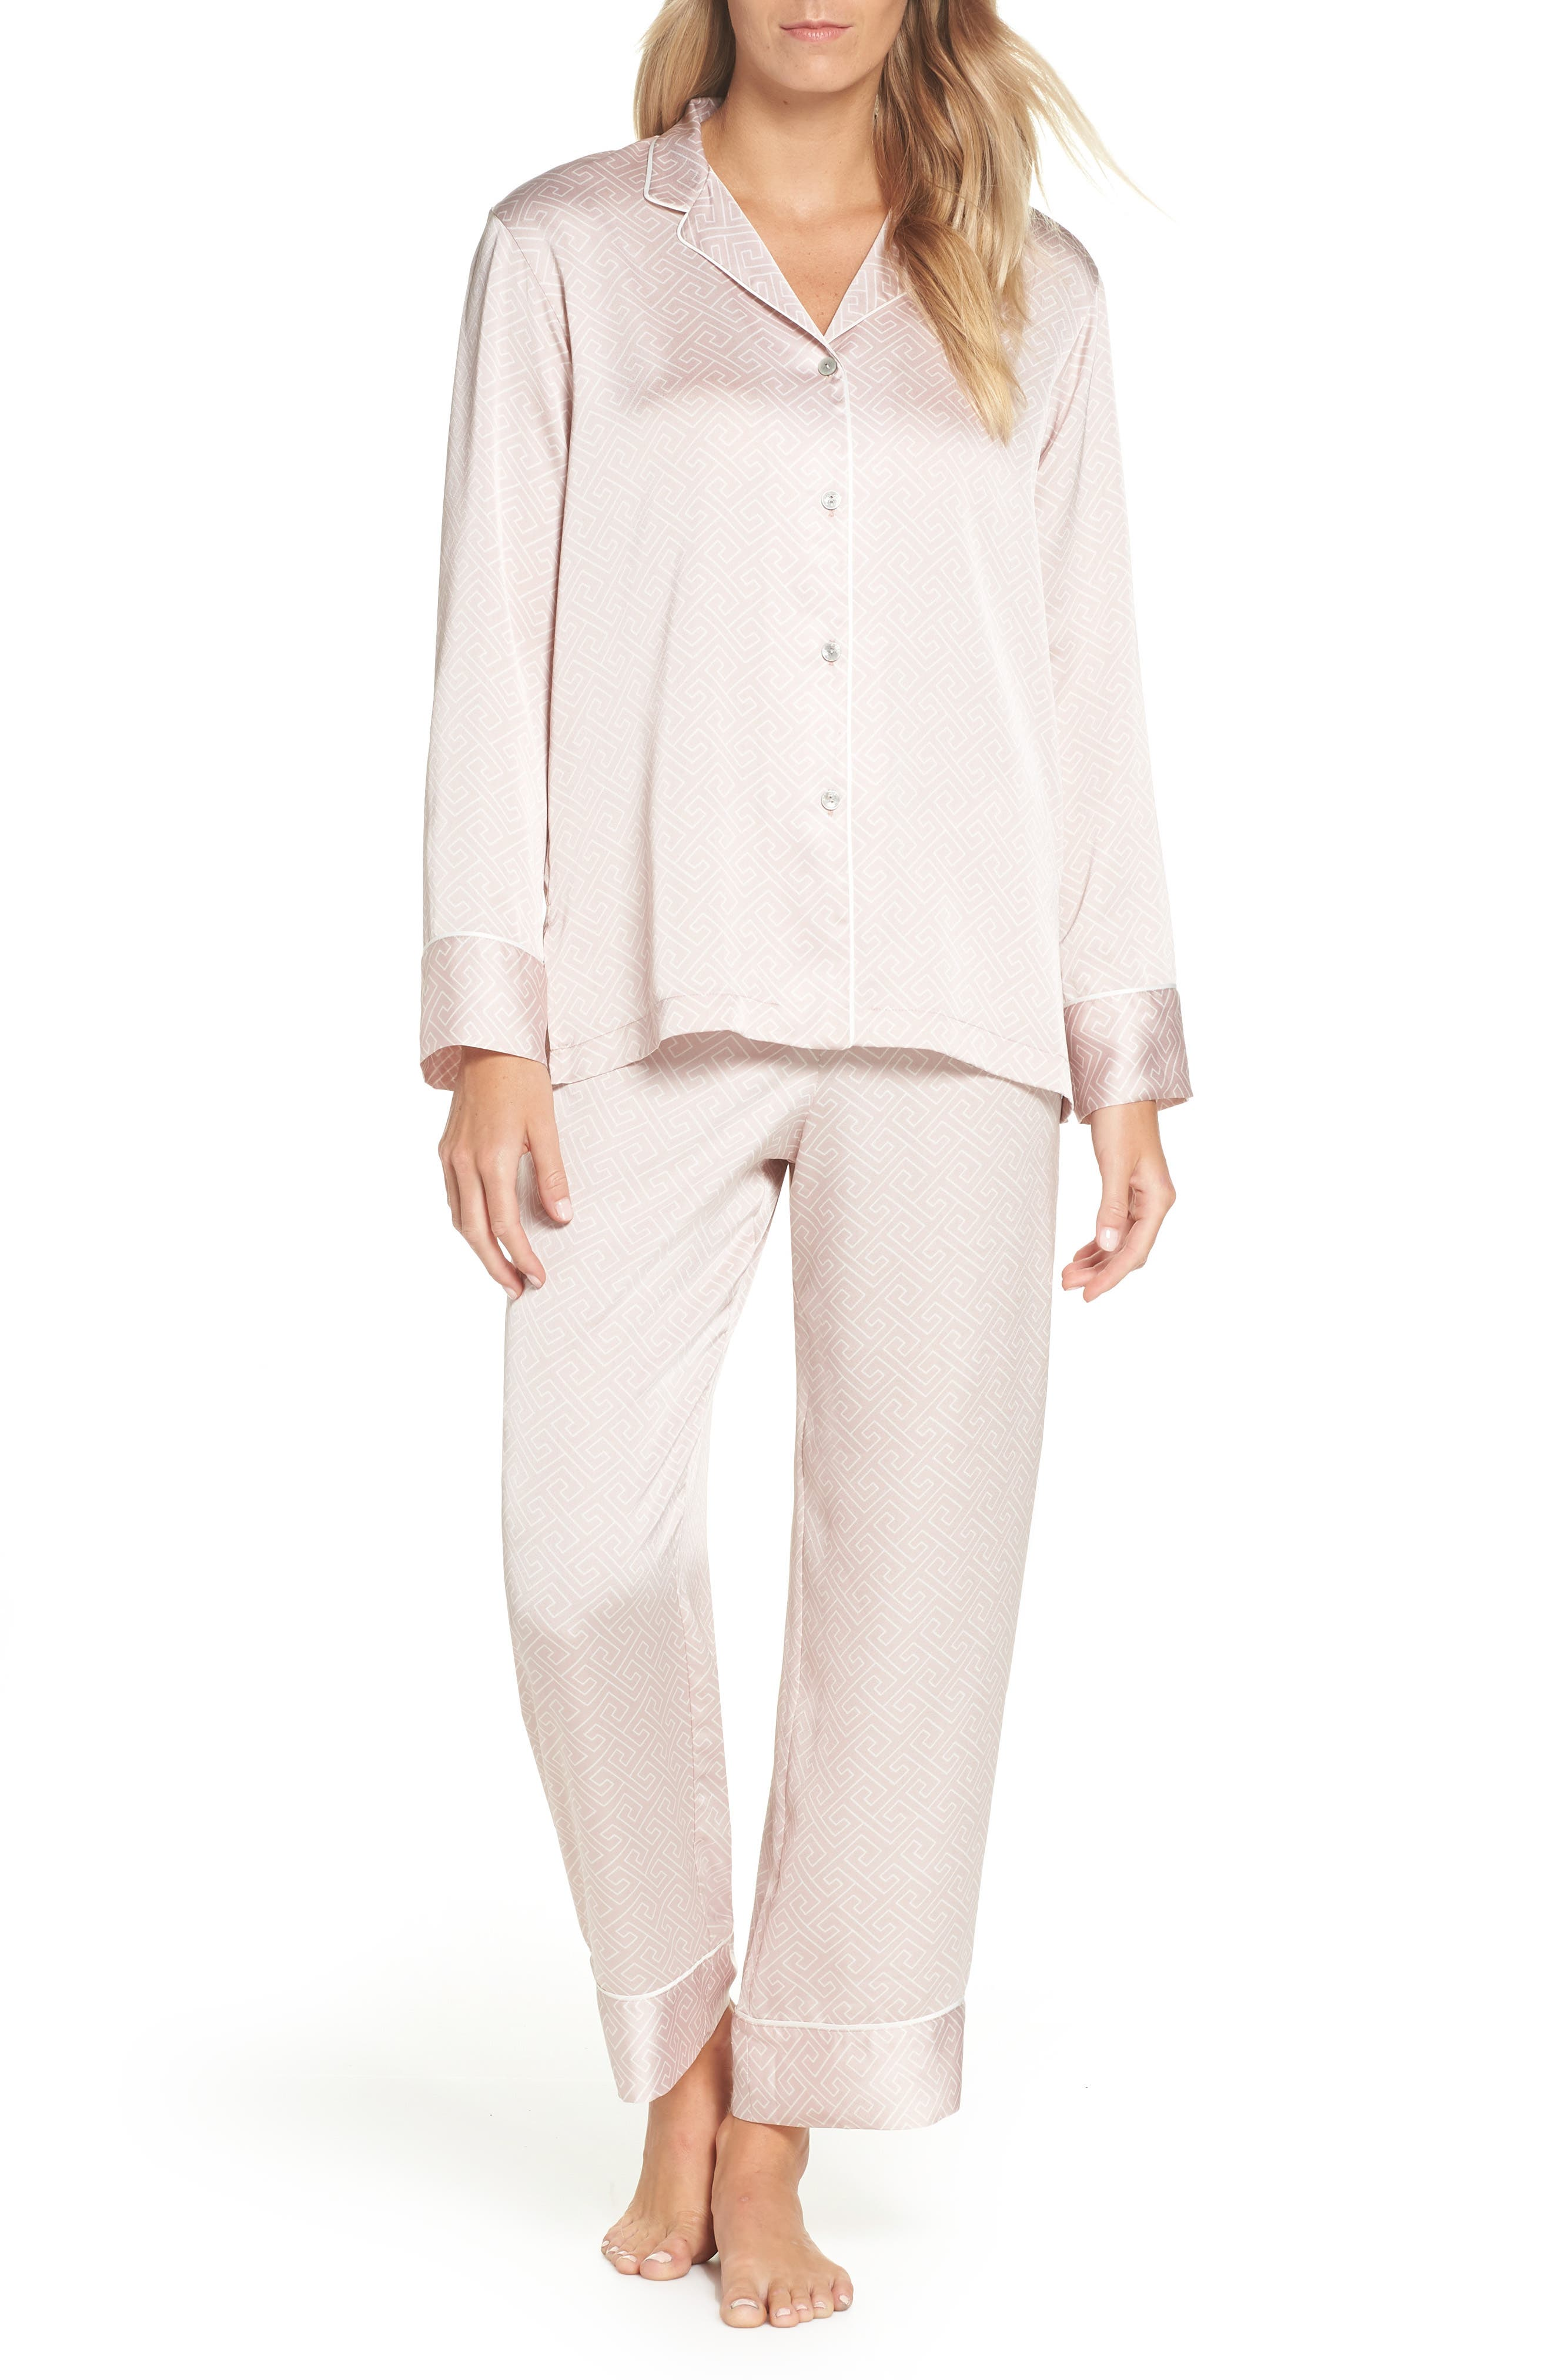 Labyrinth Satin Pajamas,                         Main,                         color, ROSE BEIGE